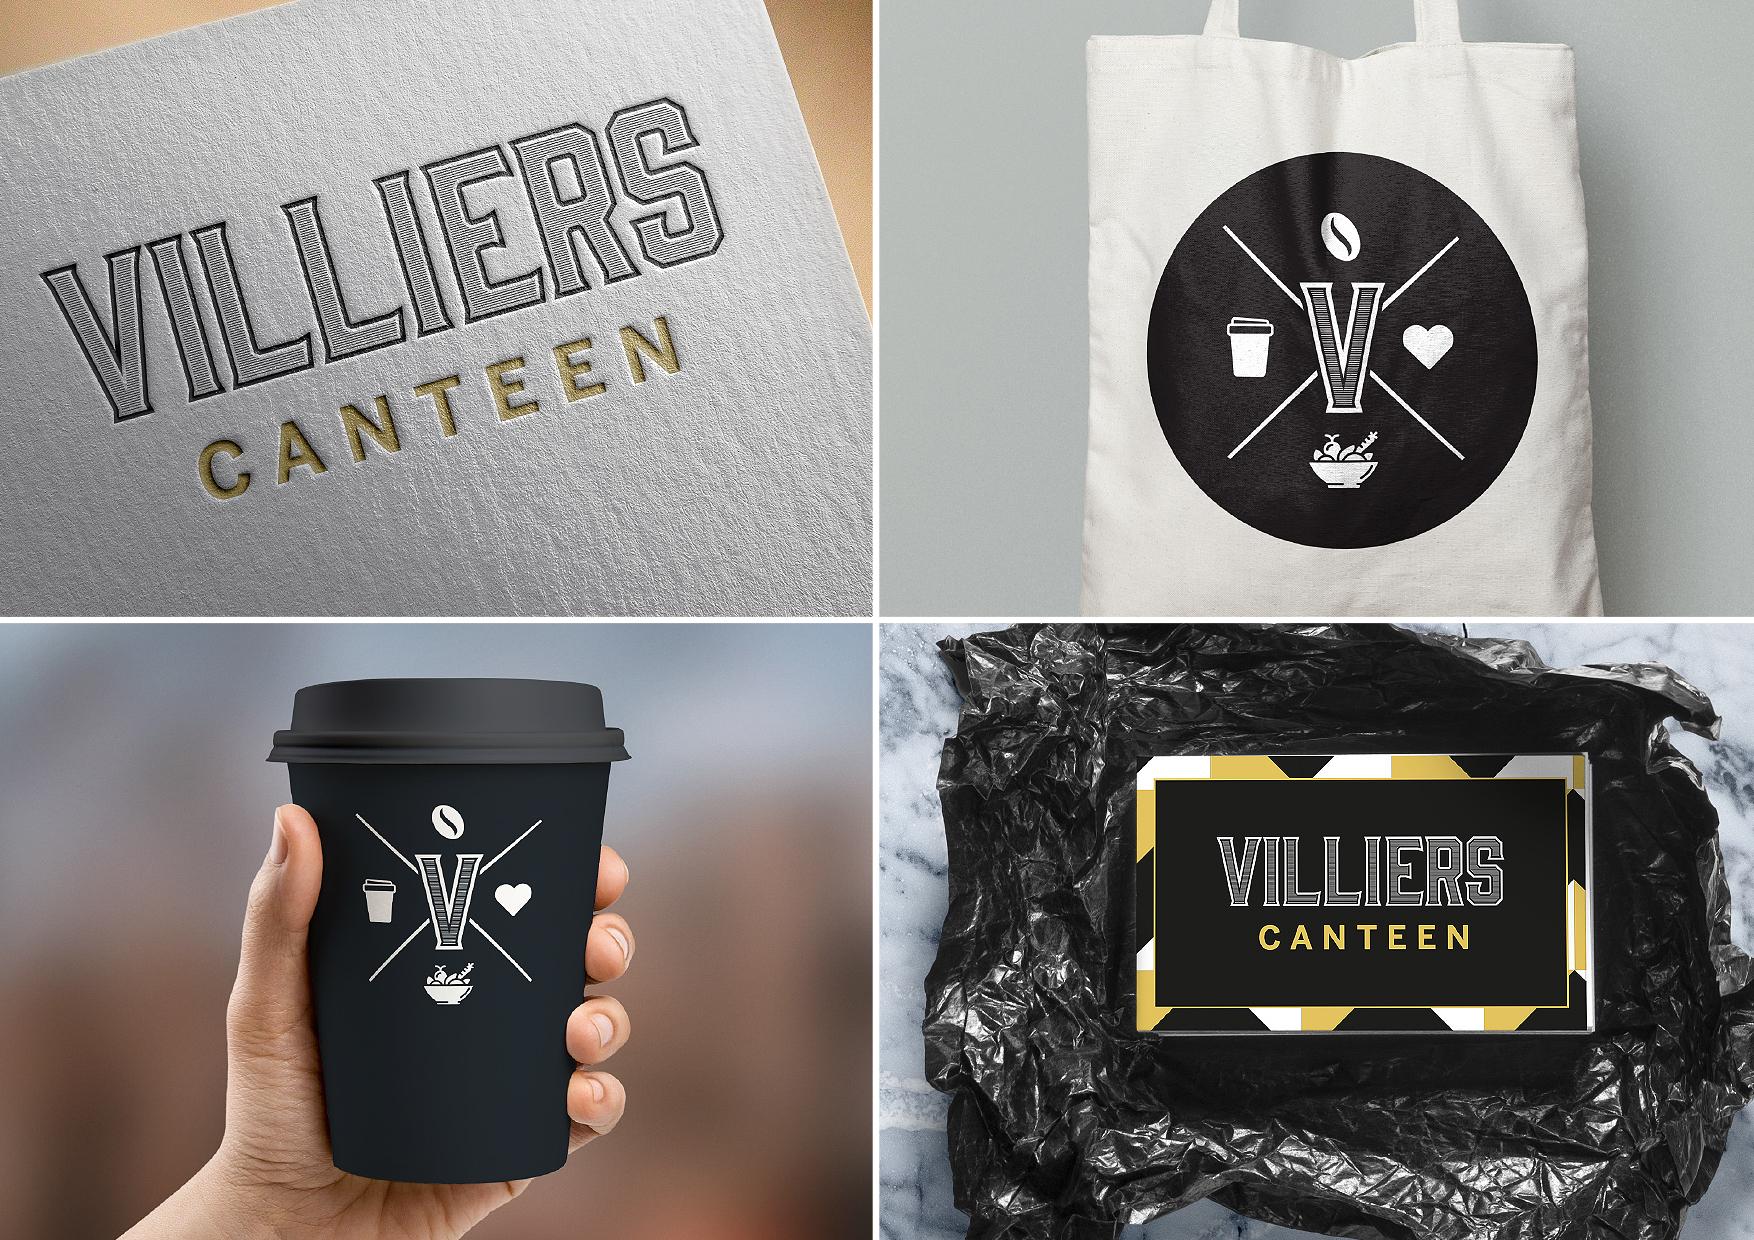 Handle-Branding-Villiers-Street-Canteen-Rebranding_02_0009_Vector-Smart-Object.jpg